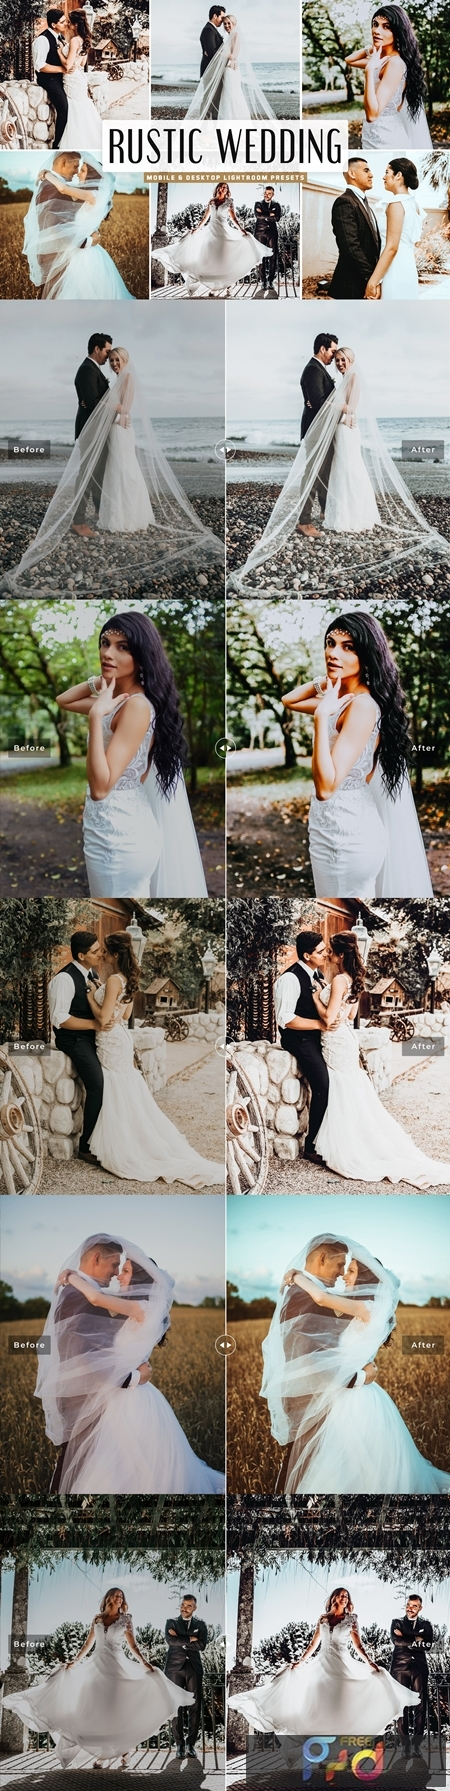 Rustic Wedding Mobile & Desktop Lightroom Presets 4746264 1